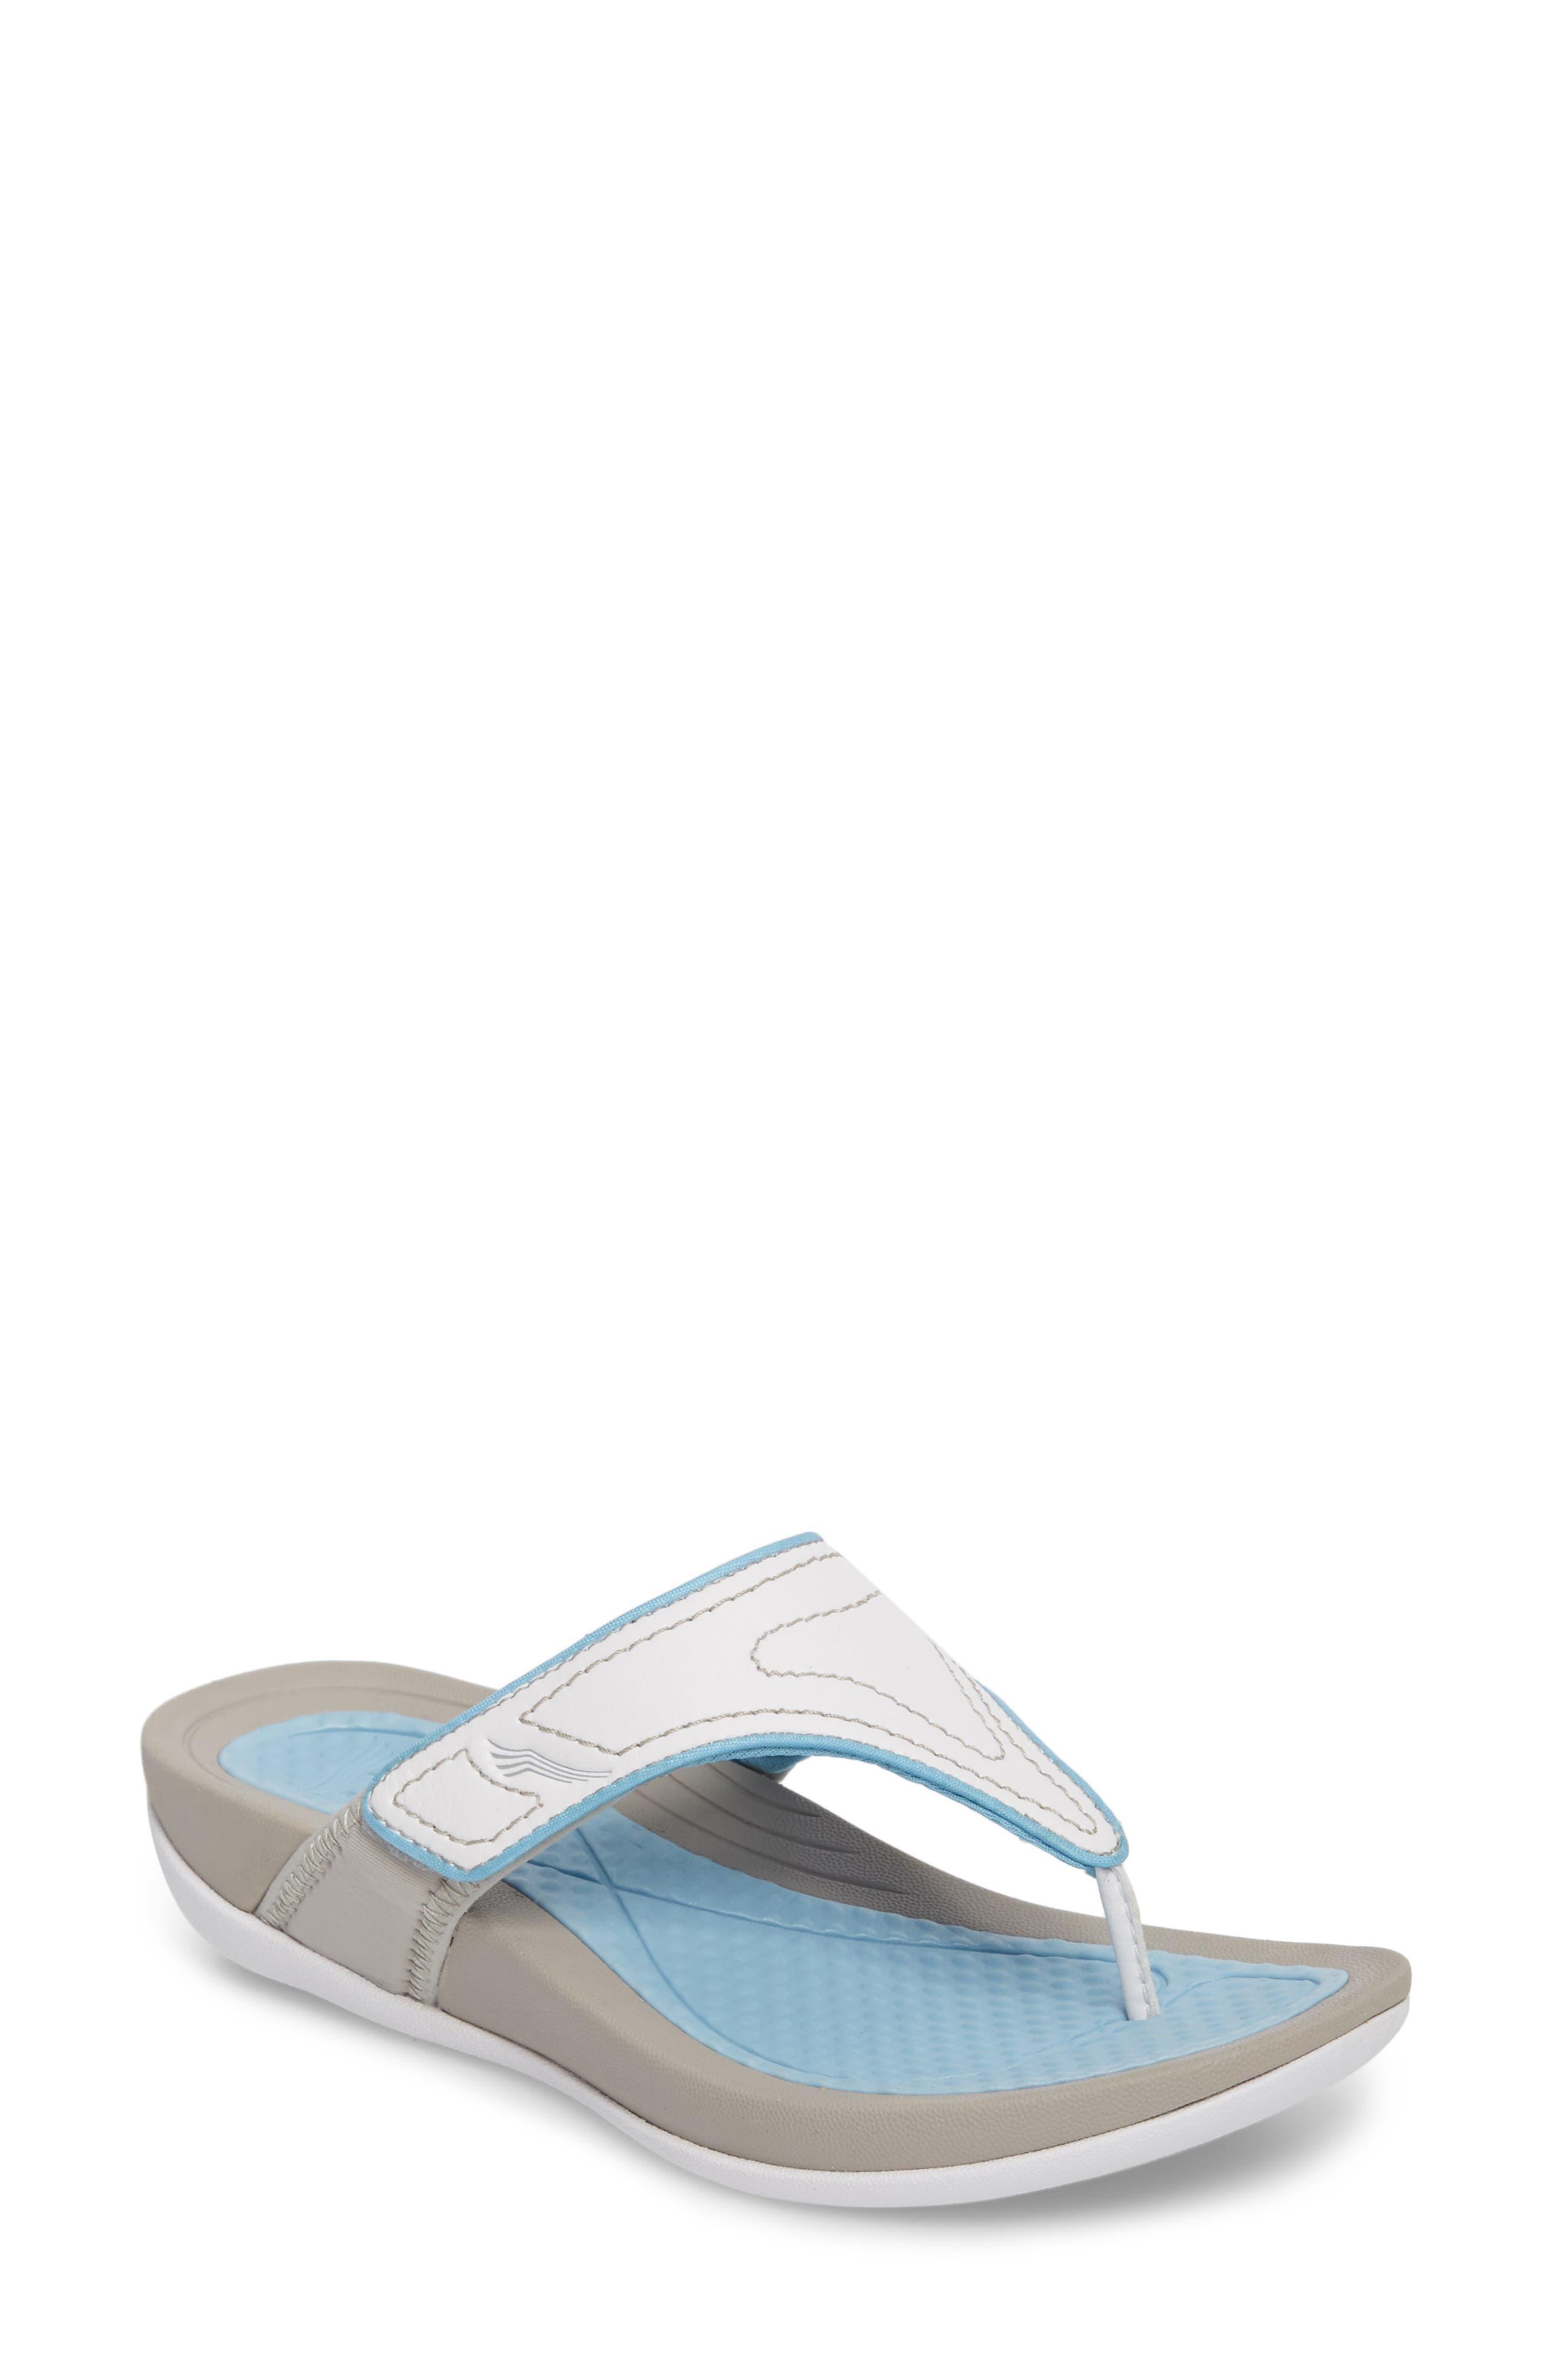 Main Image - Dansko Katy 2 Thong Sandal (Women)